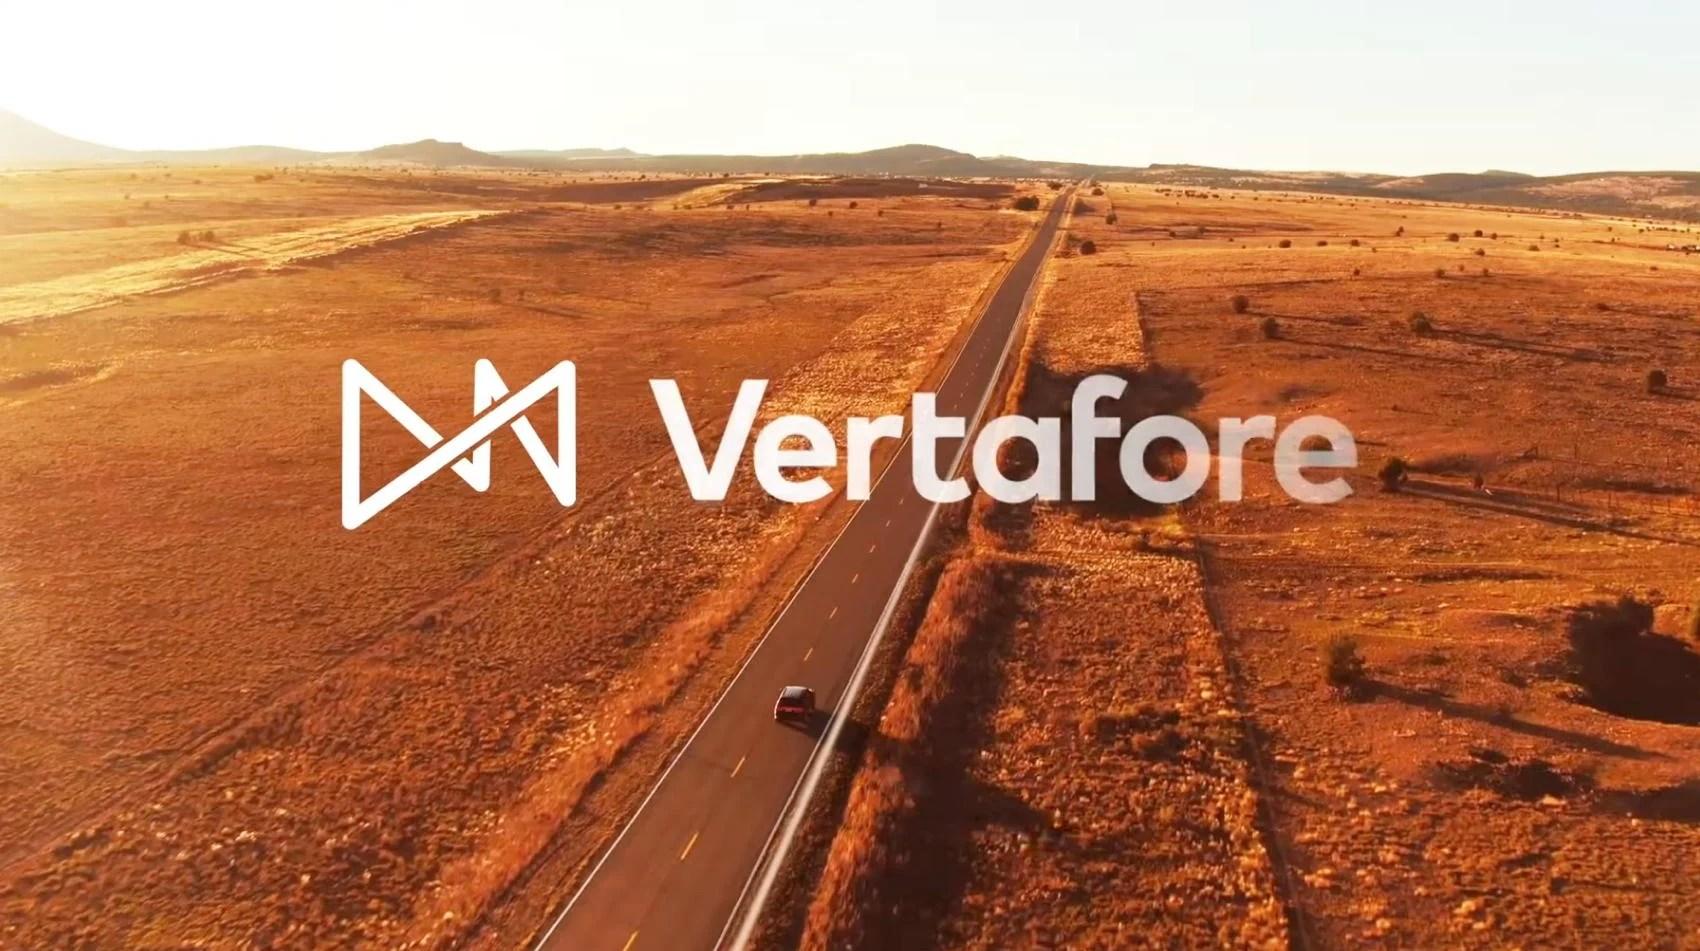 Vertafore Data Breach Exposed 28 Million Texas Driver's License Records